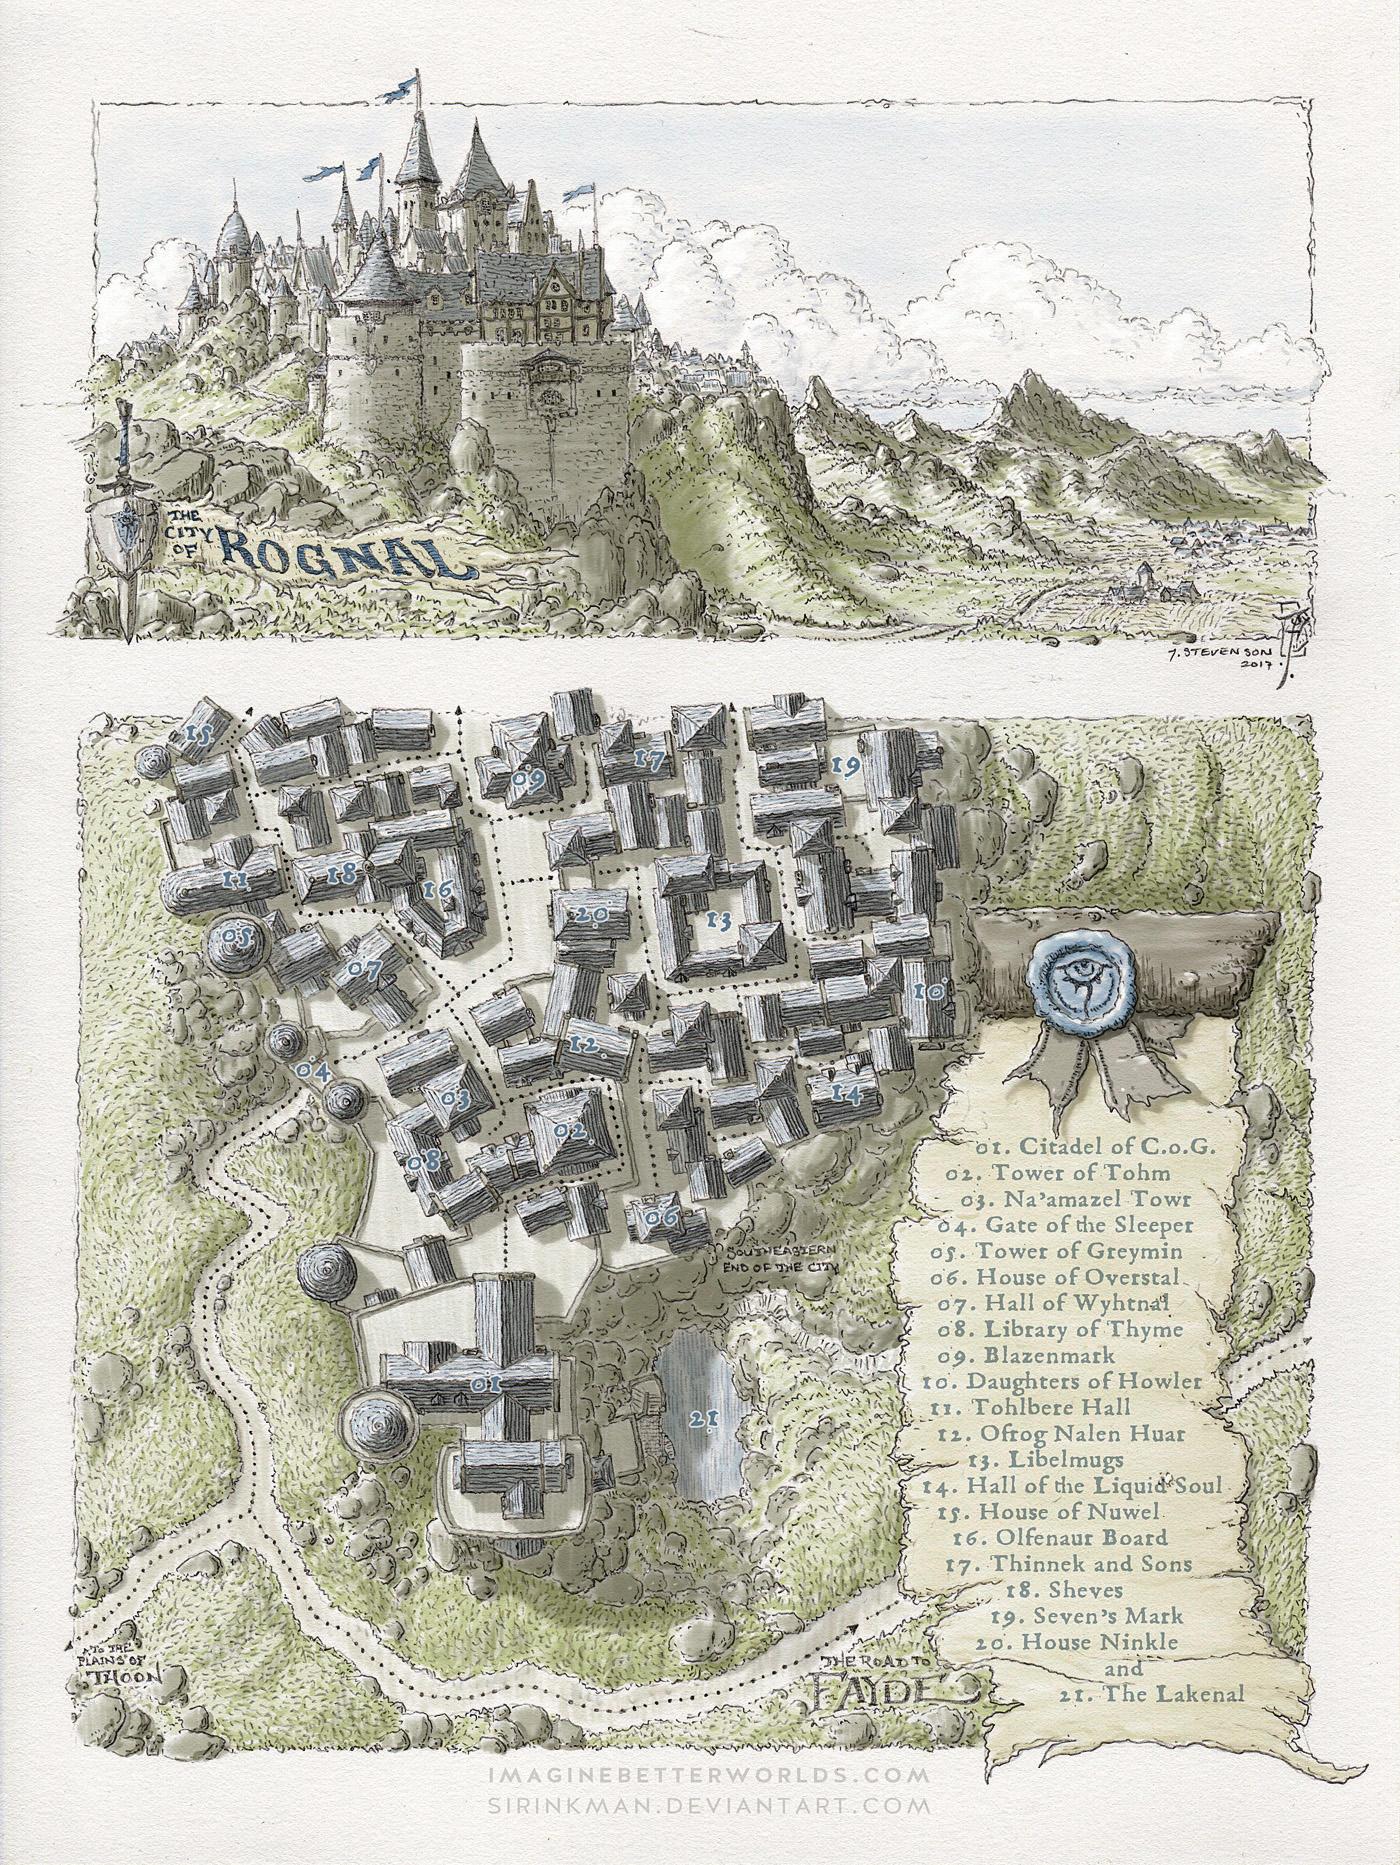 City of Rognal by SirInkman